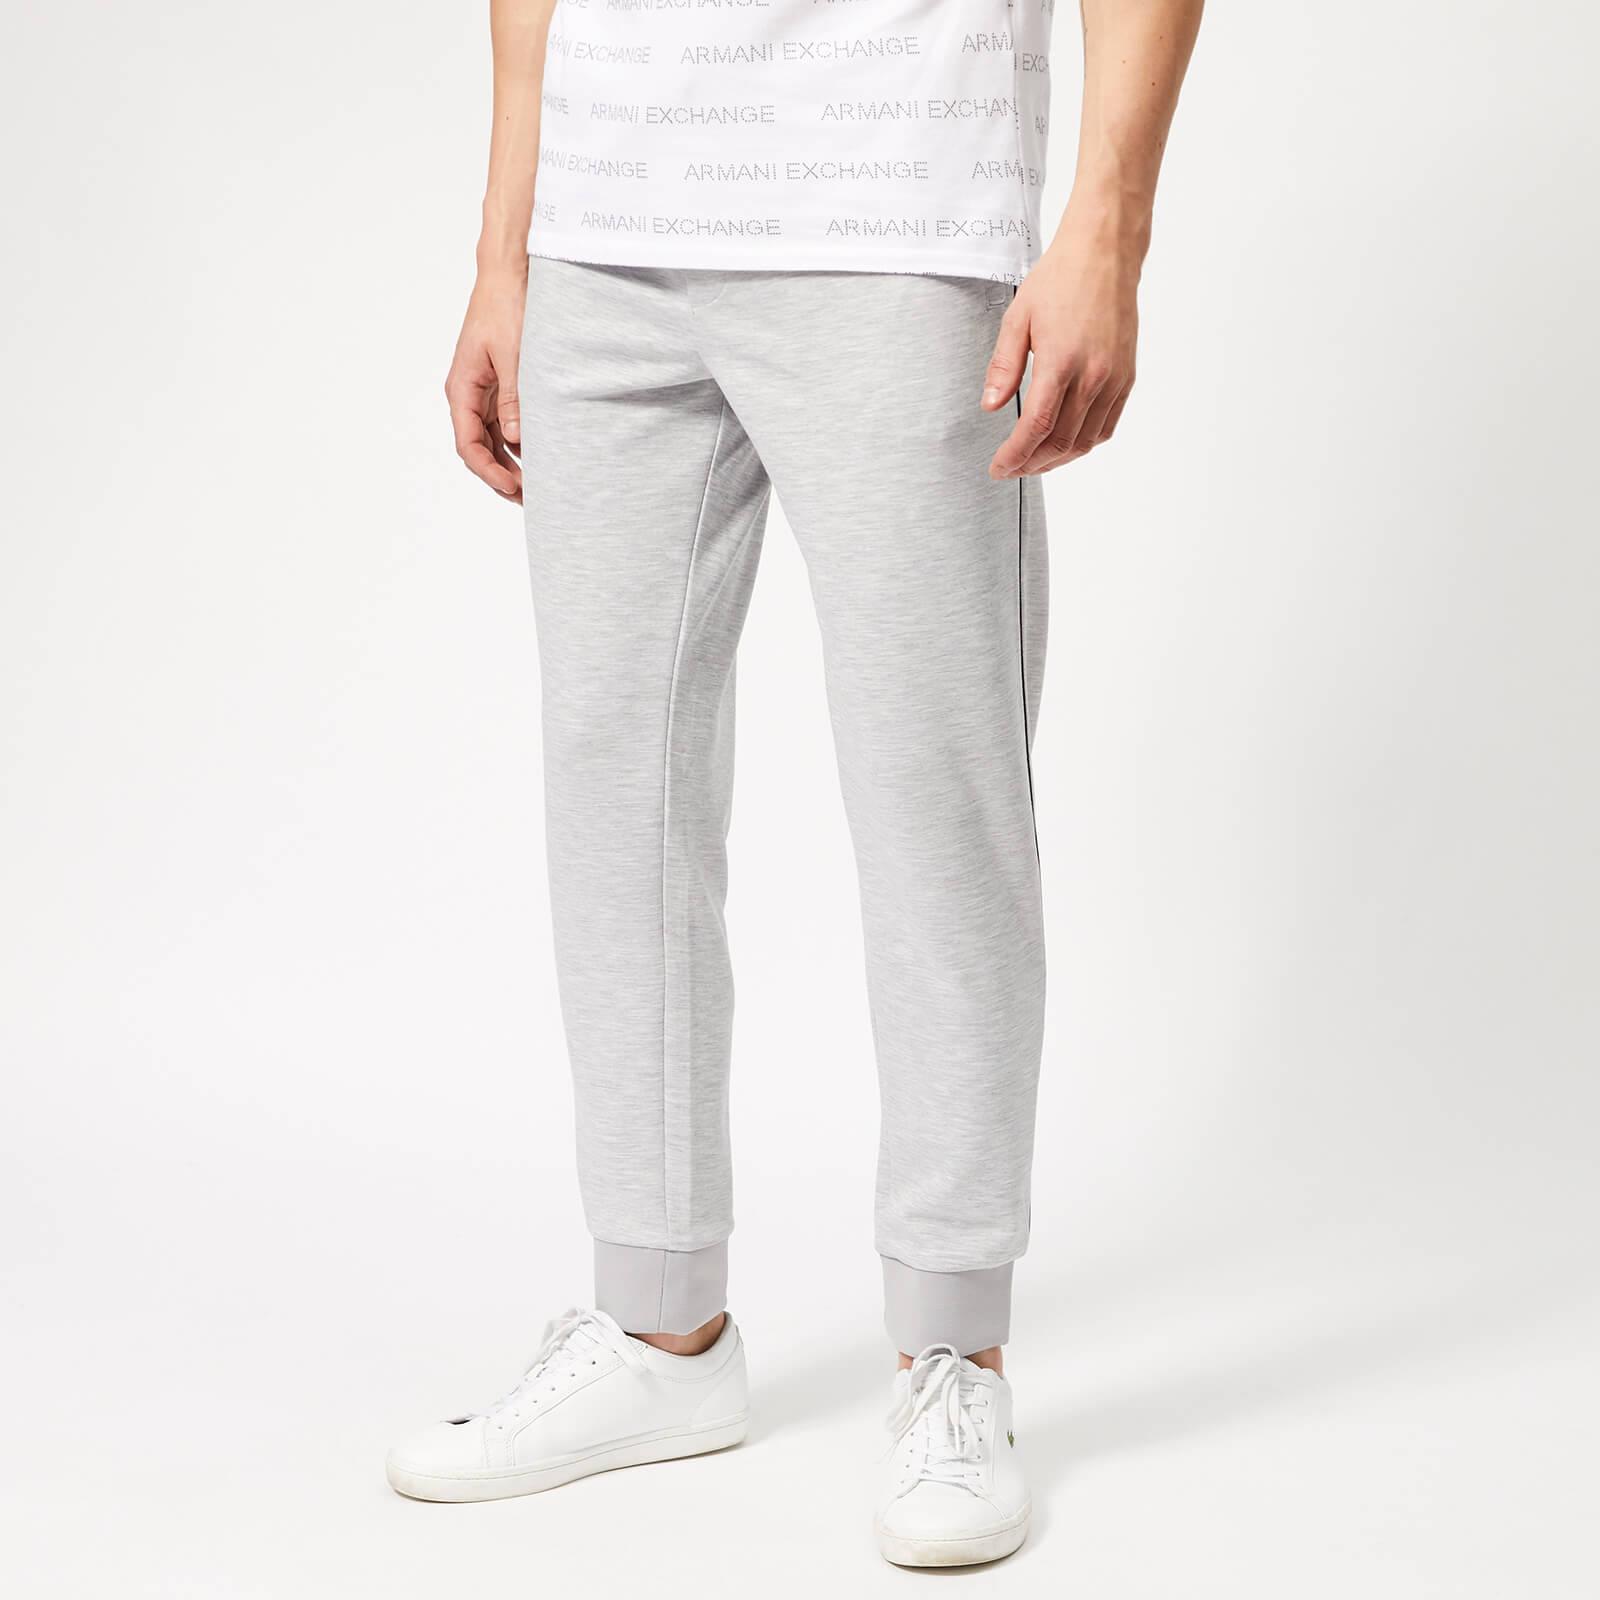 Armani Exchange Men's Small Logo Sweat Pants - Heather Grey - S - Grey